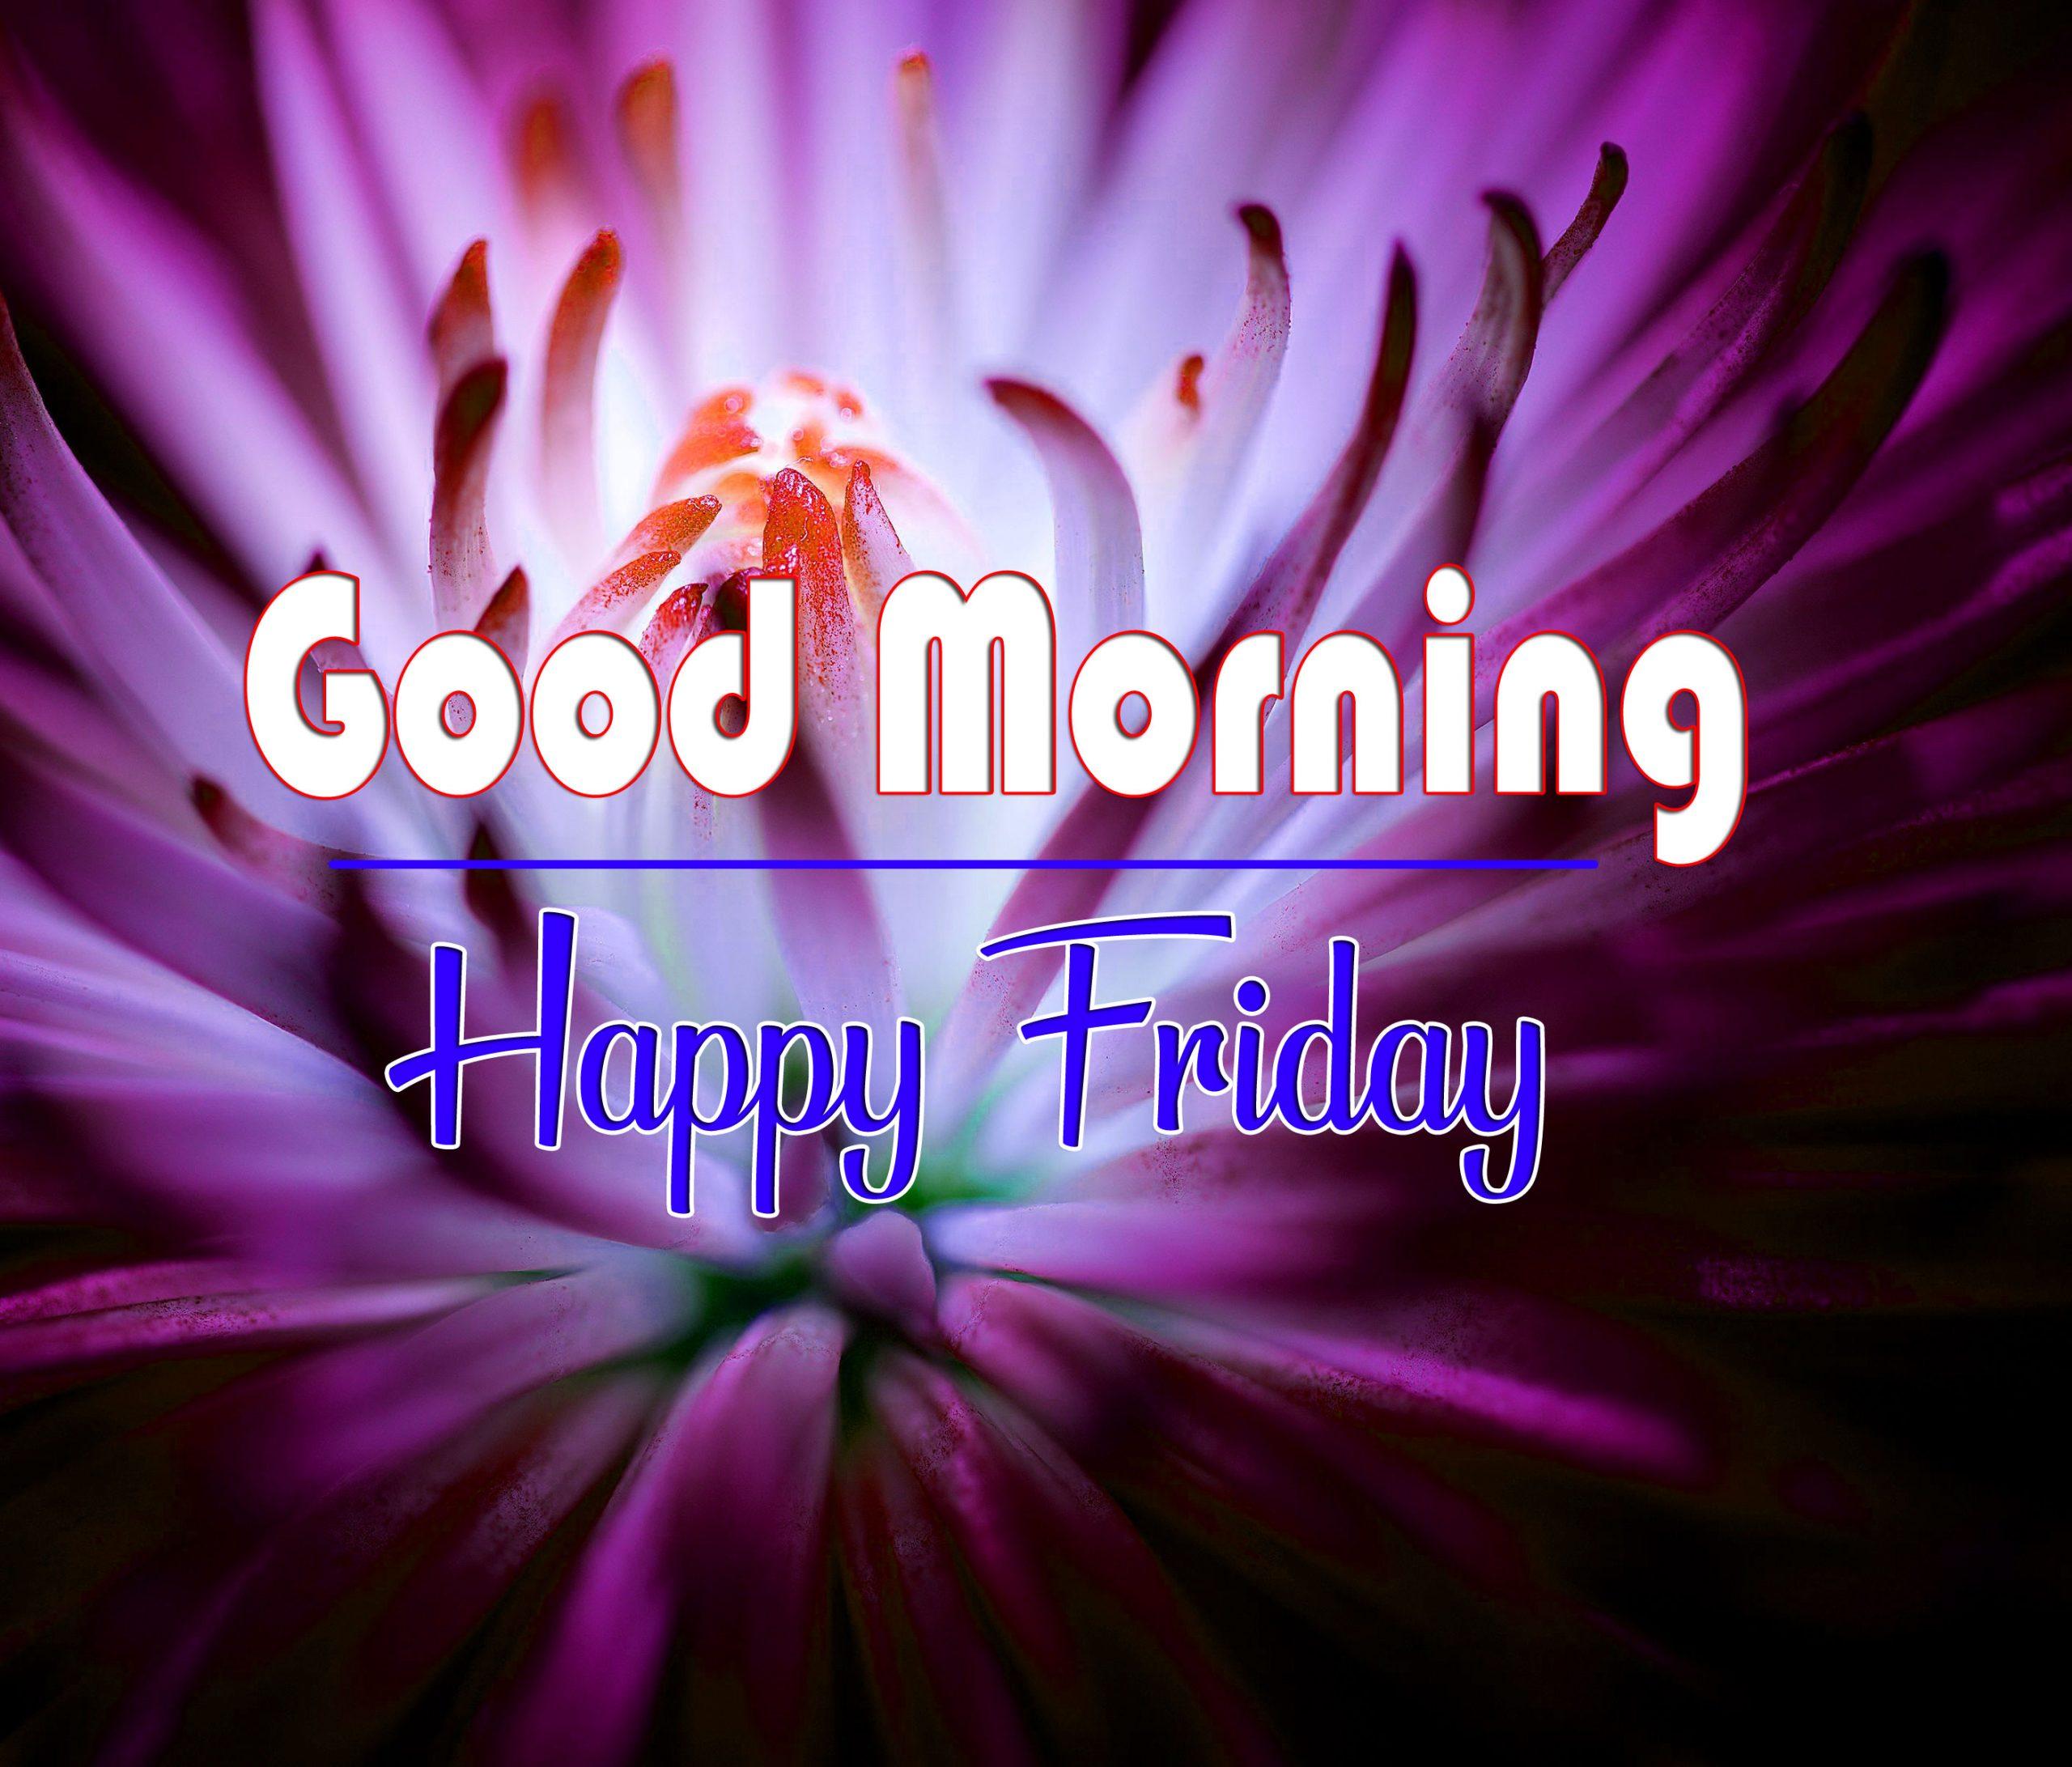 friday Good morning Wishes Pics Free